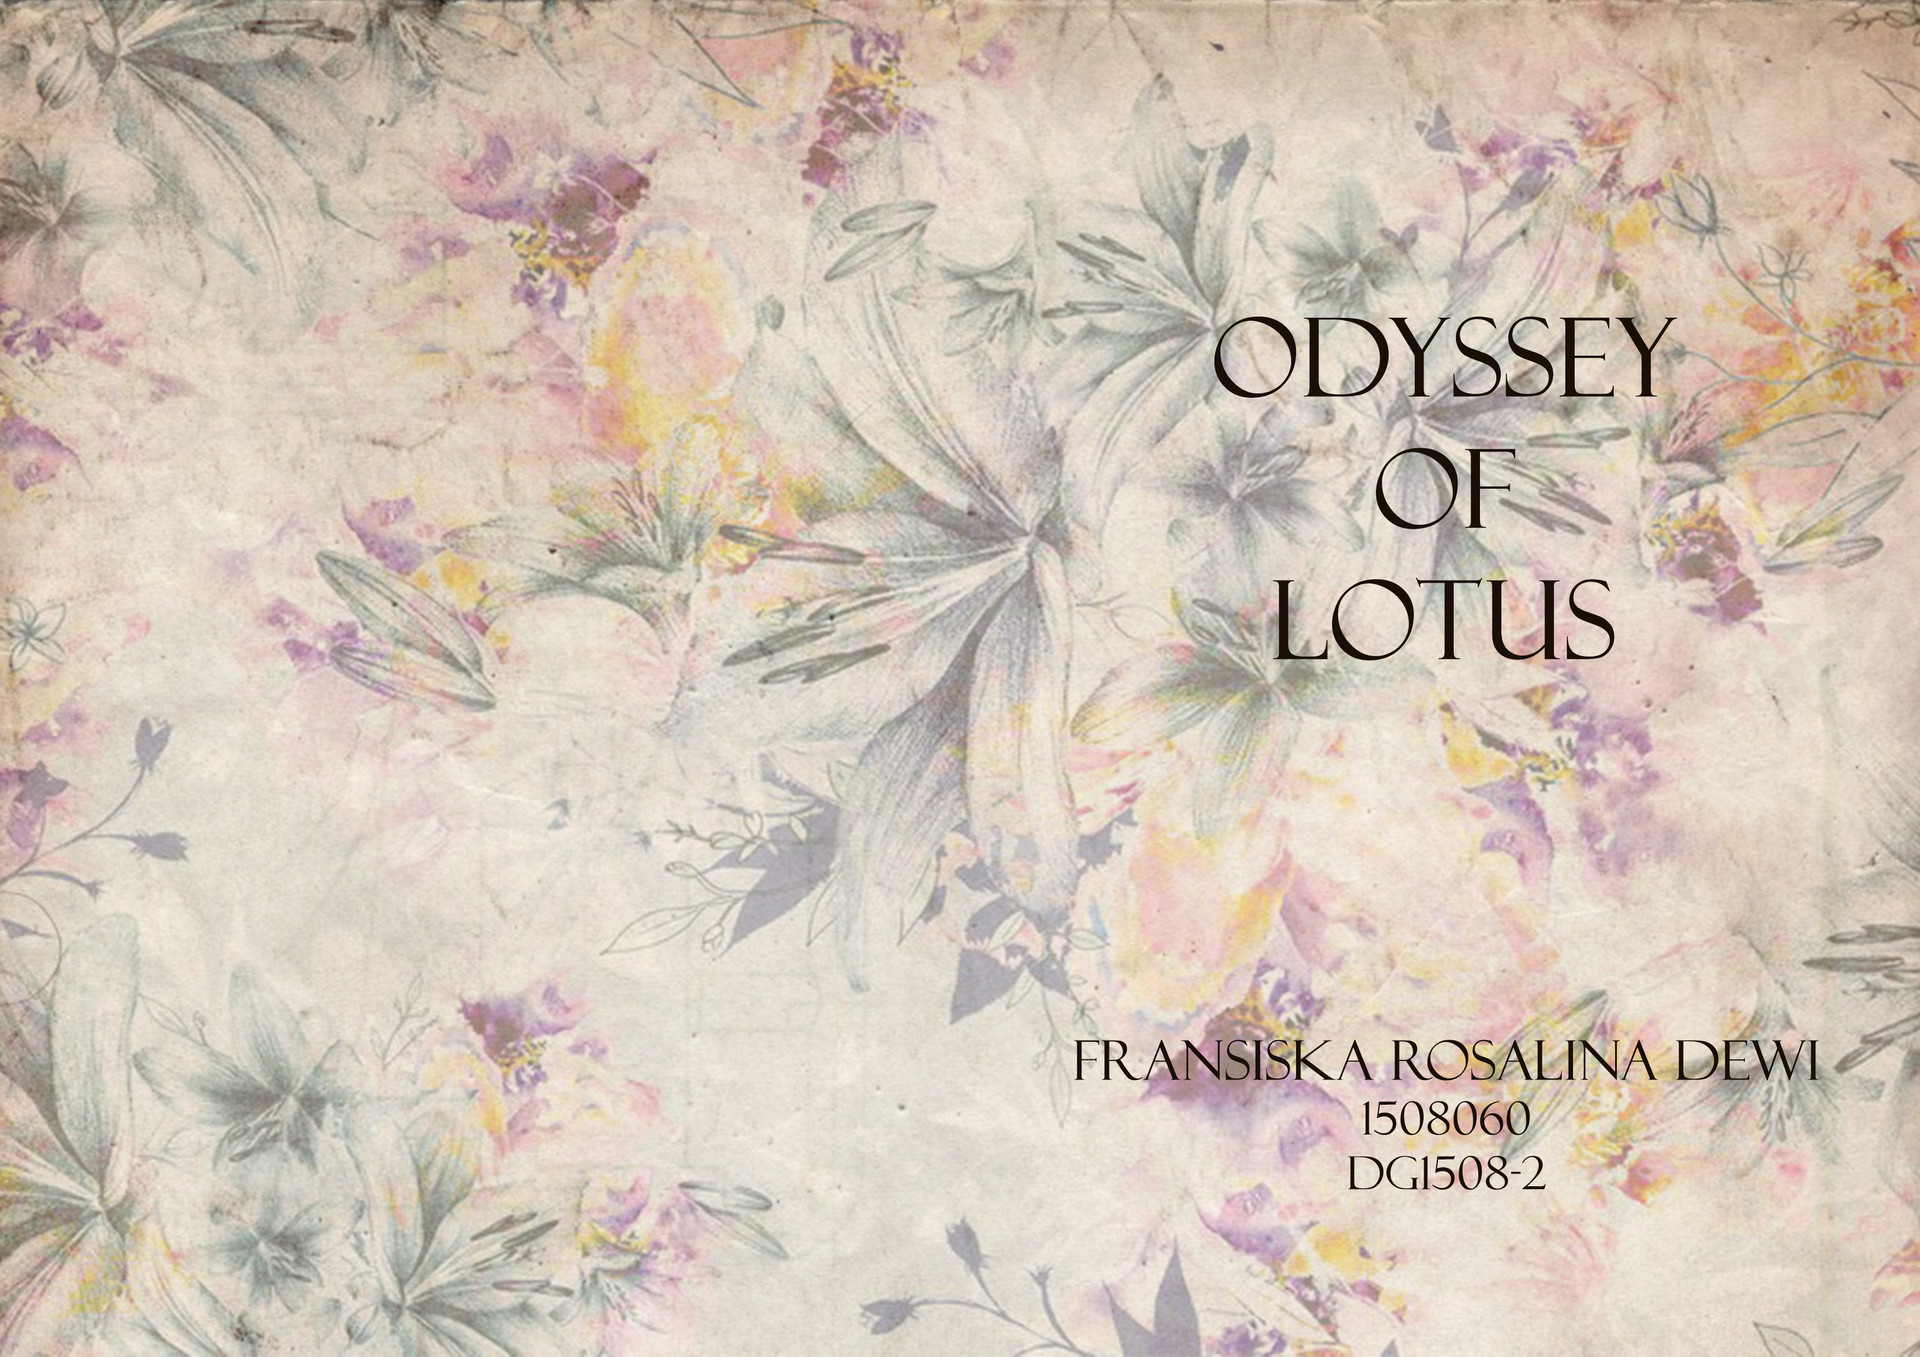 Fransiska rosalina dewi odyssey of lotus xavier francis 1 cover izmirmasajfo